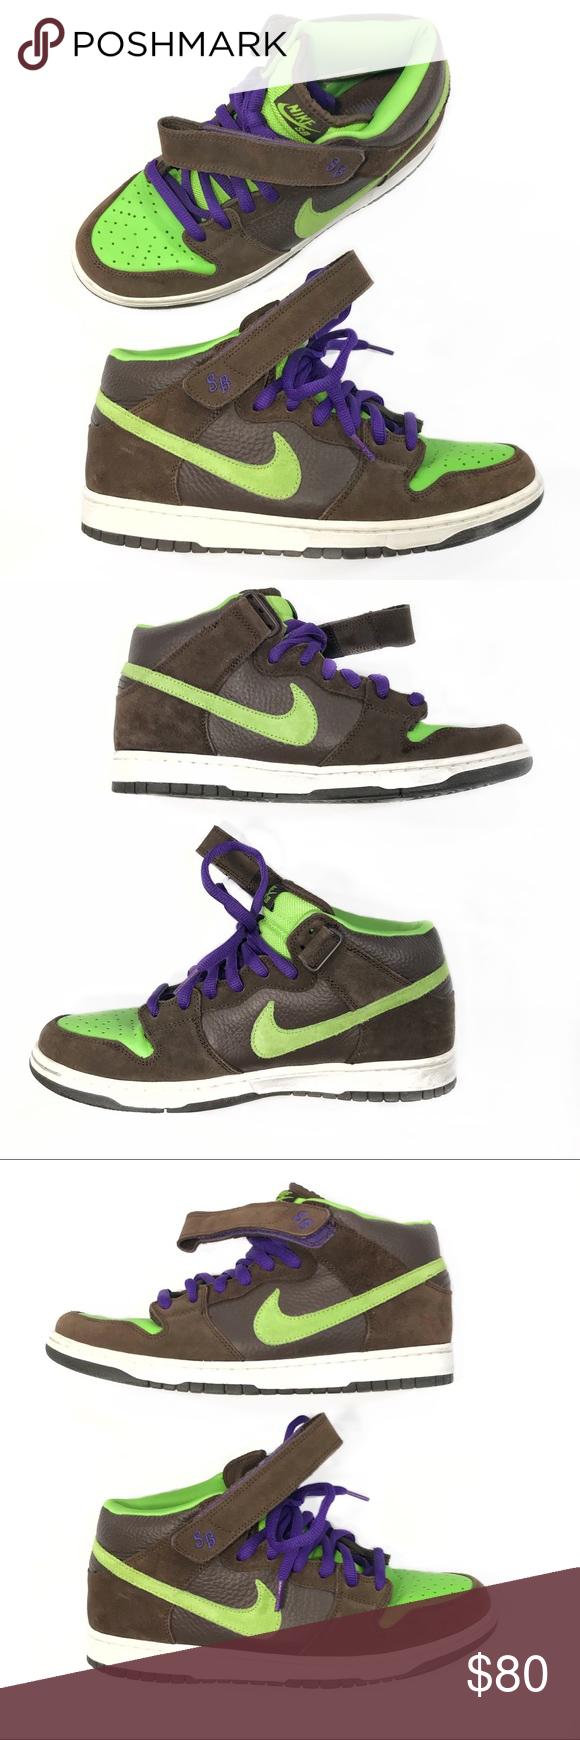 01351c6aa26 Nike SB Dunk Mid Pro Donatello Brand  Nike Sb Item name  Donatello Style  number